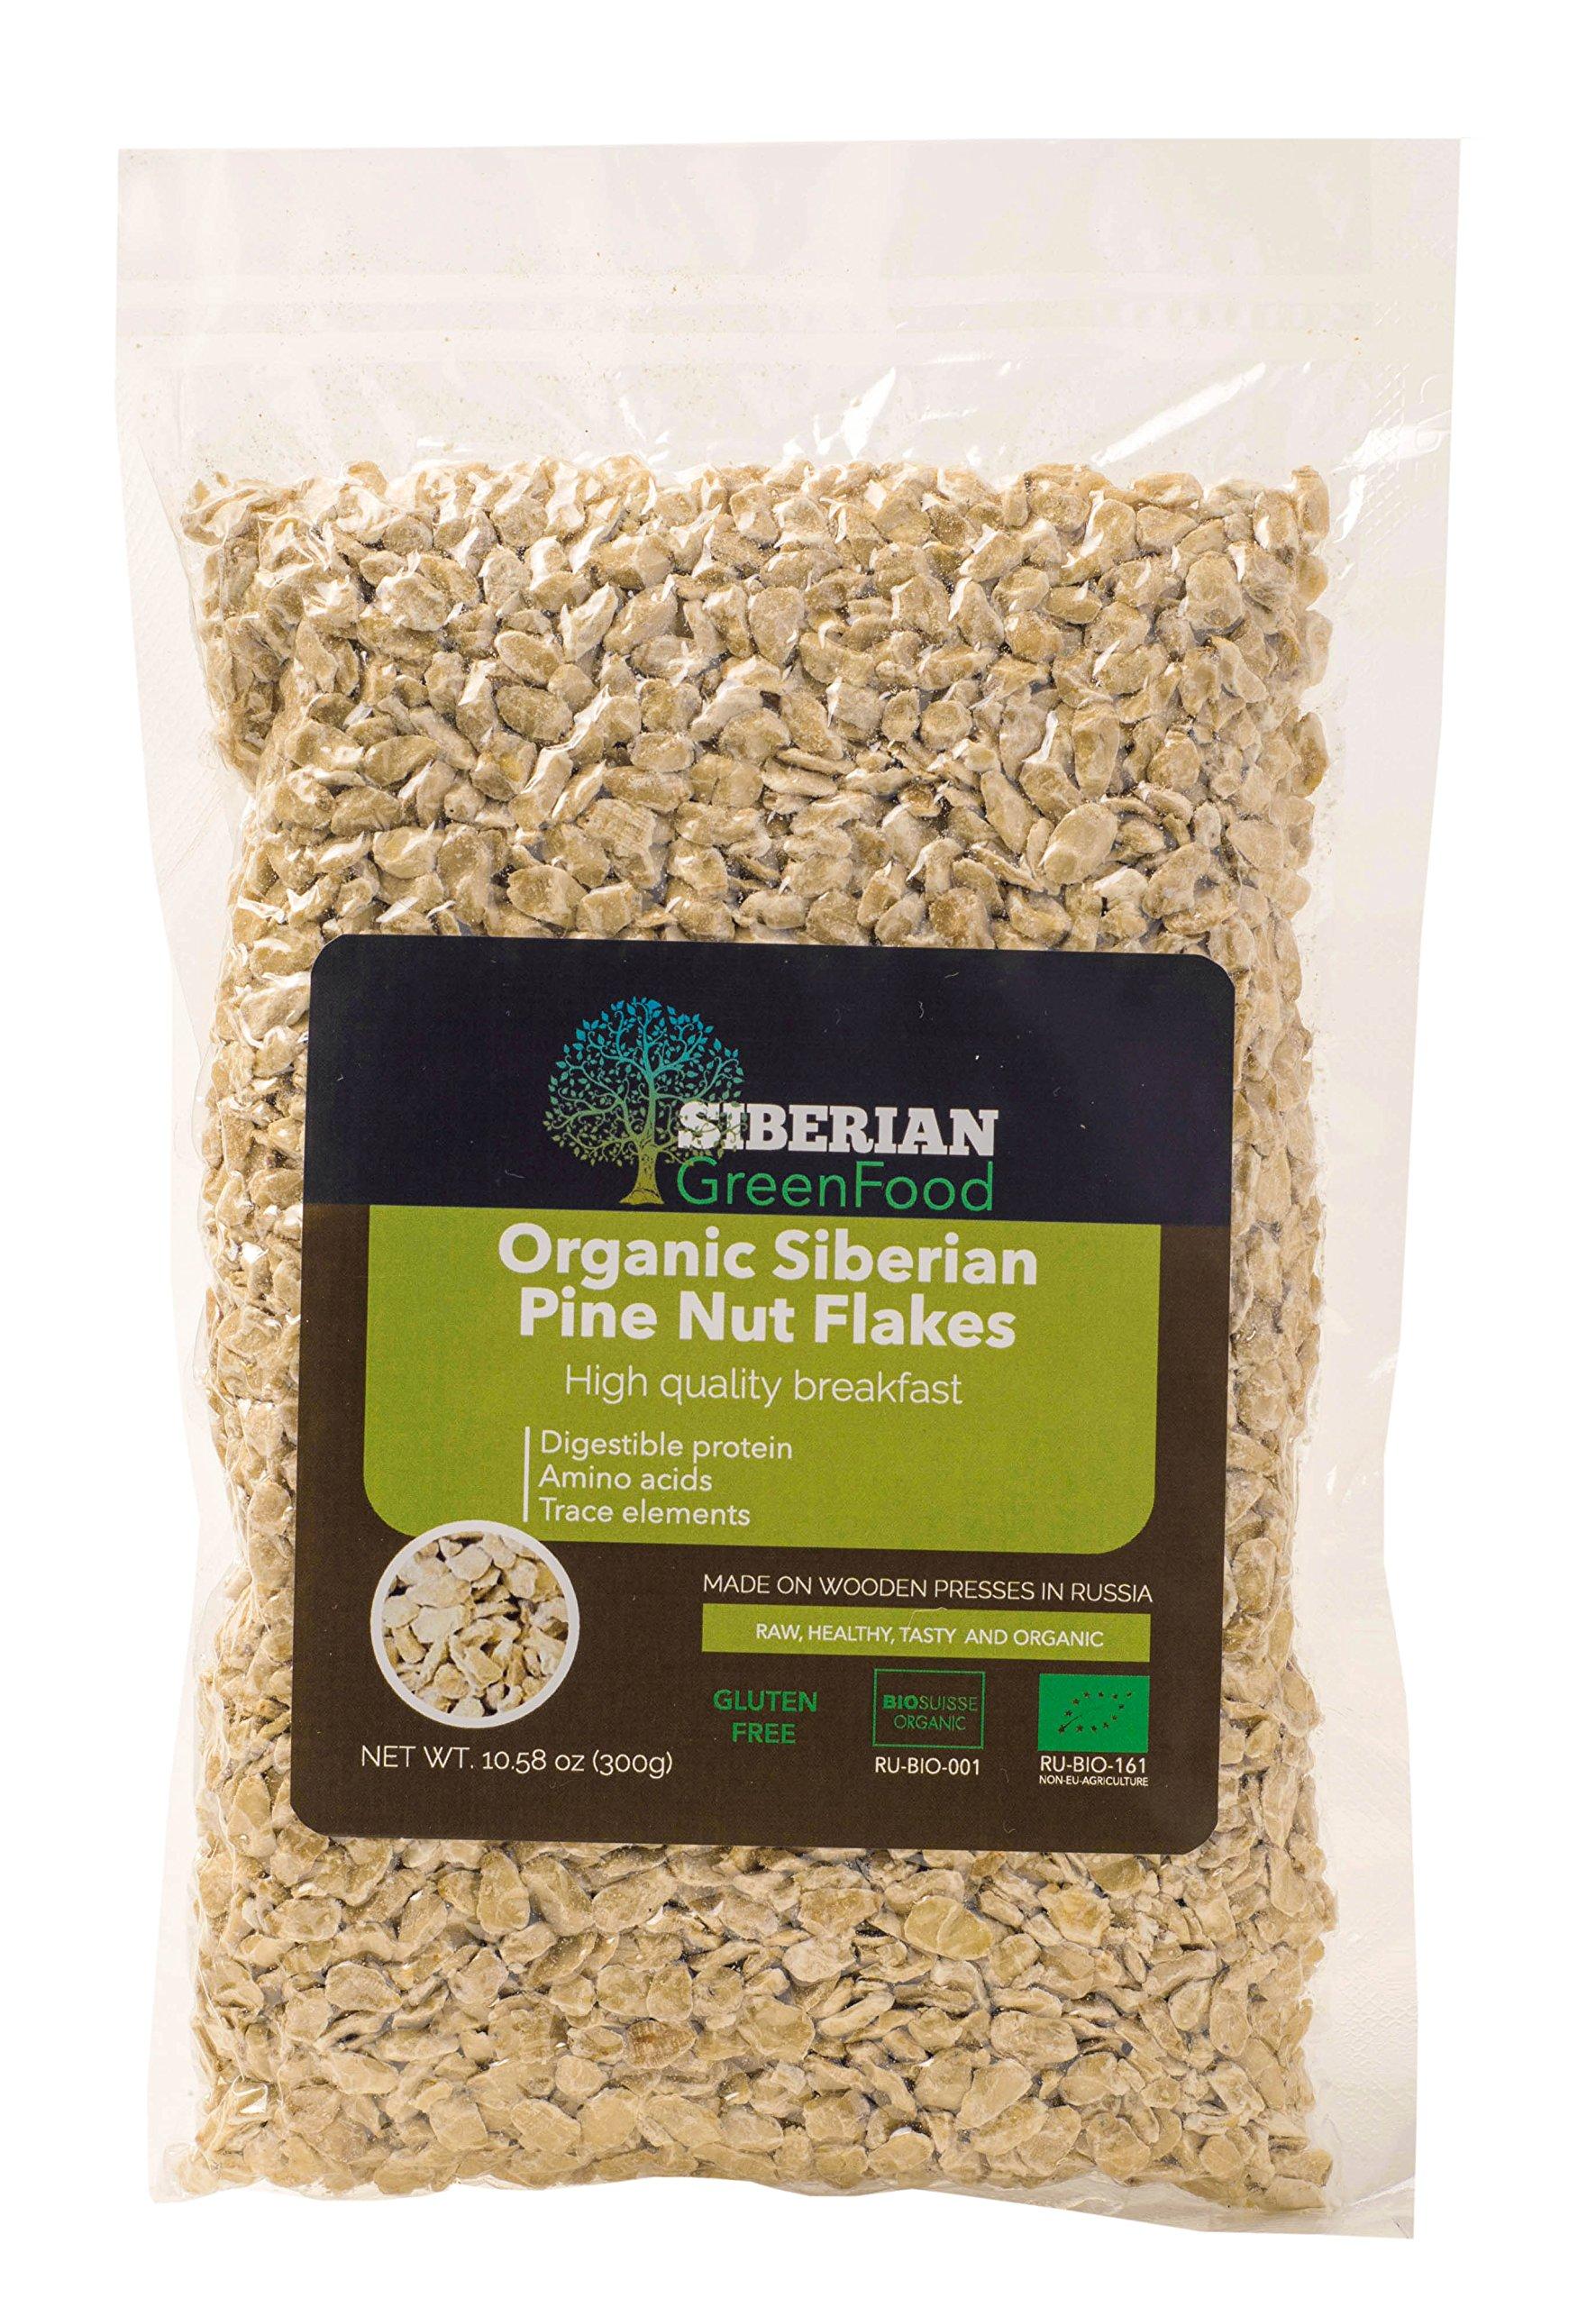 Organic Pine Nuts Flakes (low fat) 300gr/10.58oz vacuum pack by Siberian Green Food, European organic certificate.